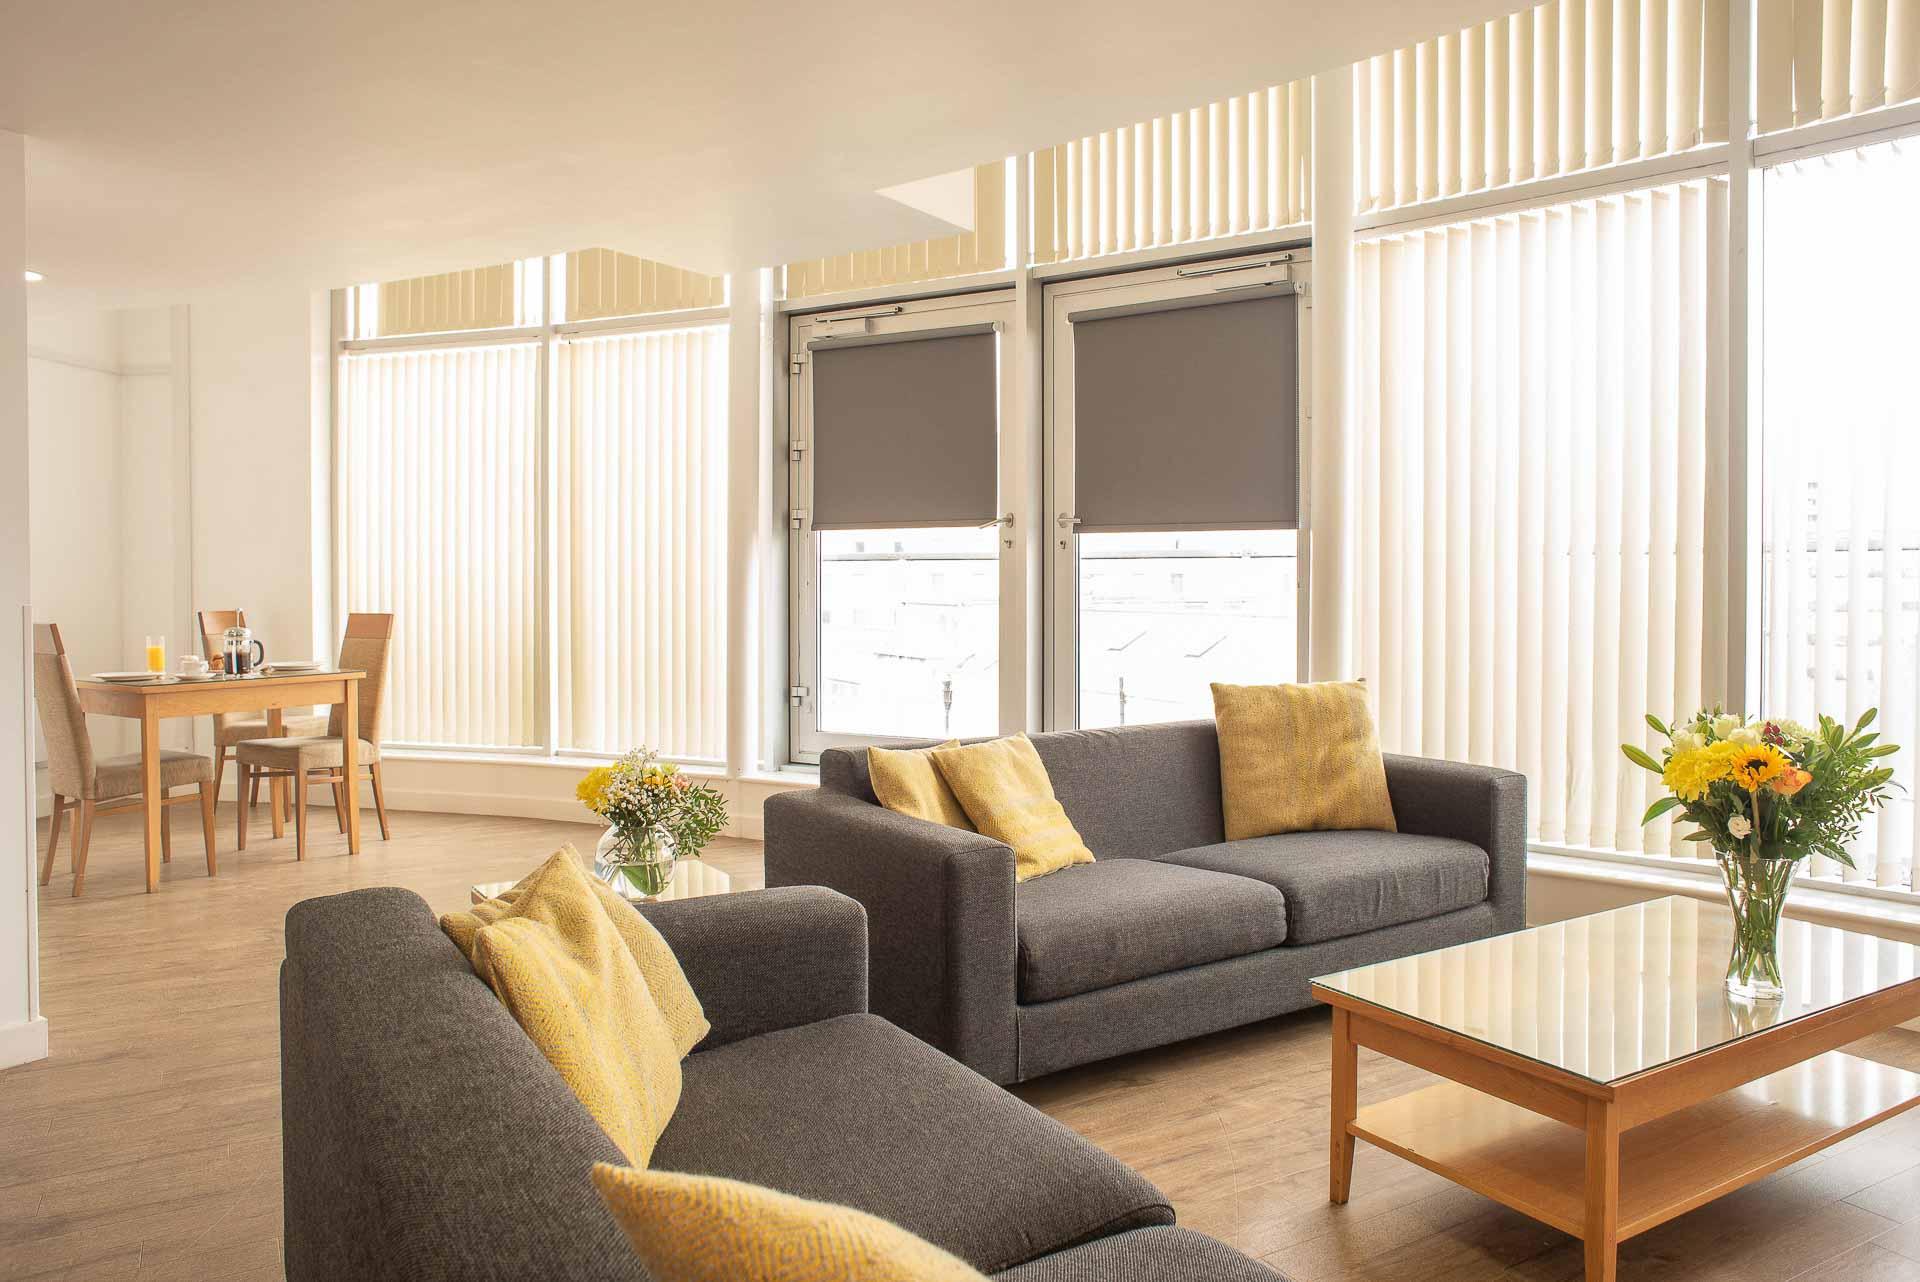 Spacious apartment at Premier Suites Liverpool, Centre, Liverpool - Citybase Apartments